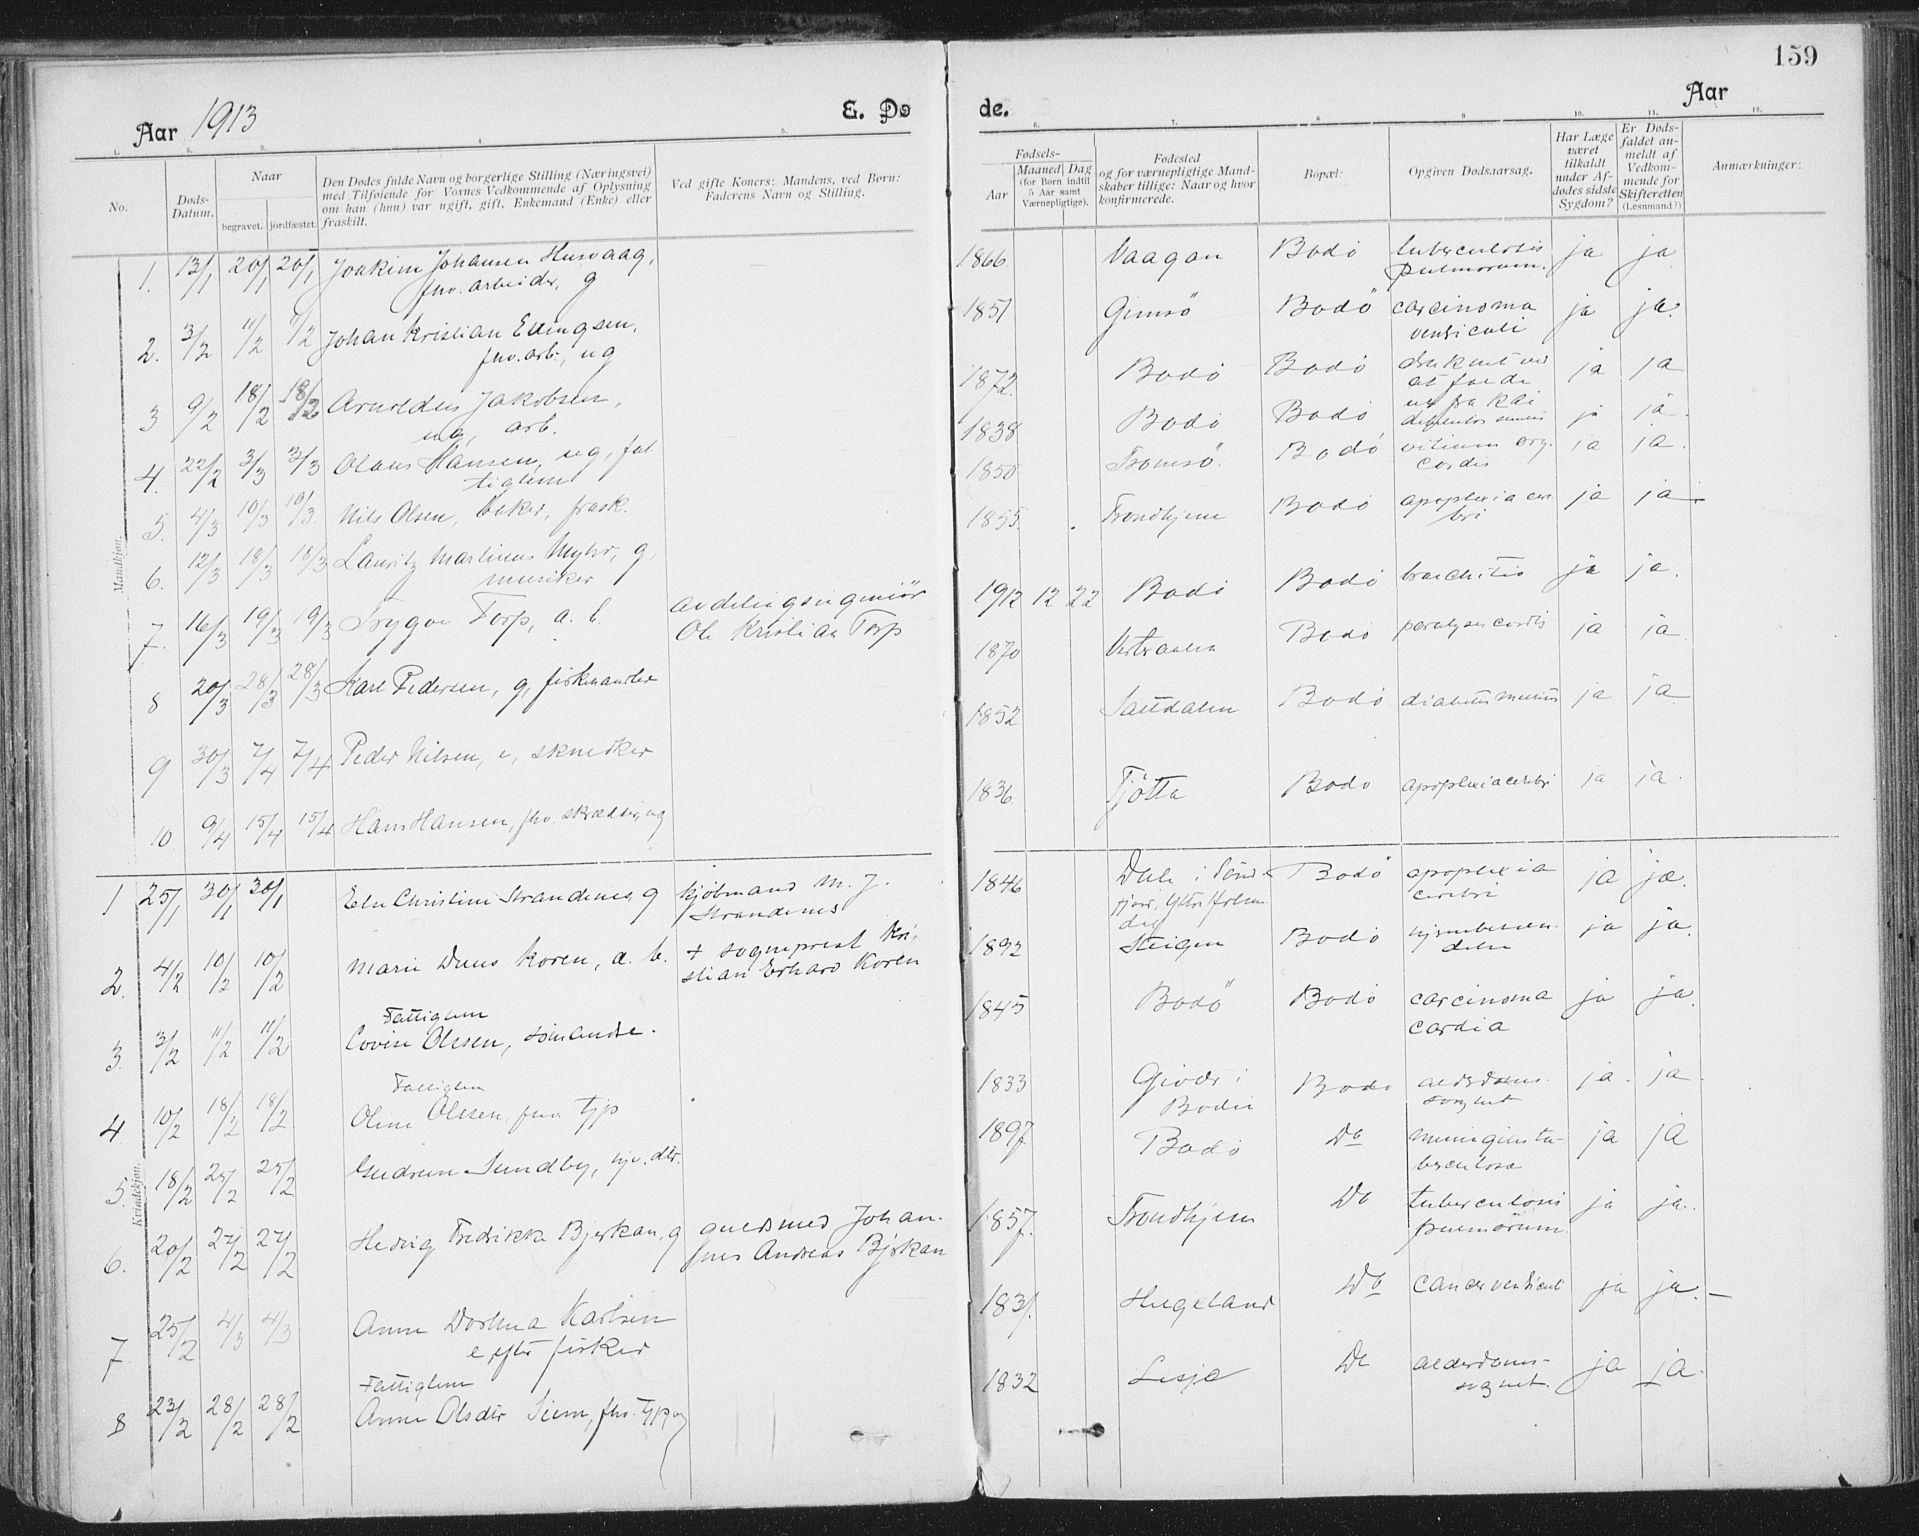 SAT, Ministerialprotokoller, klokkerbøker og fødselsregistre - Nordland, 801/L0012: Ministerialbok nr. 801A12, 1900-1916, s. 159